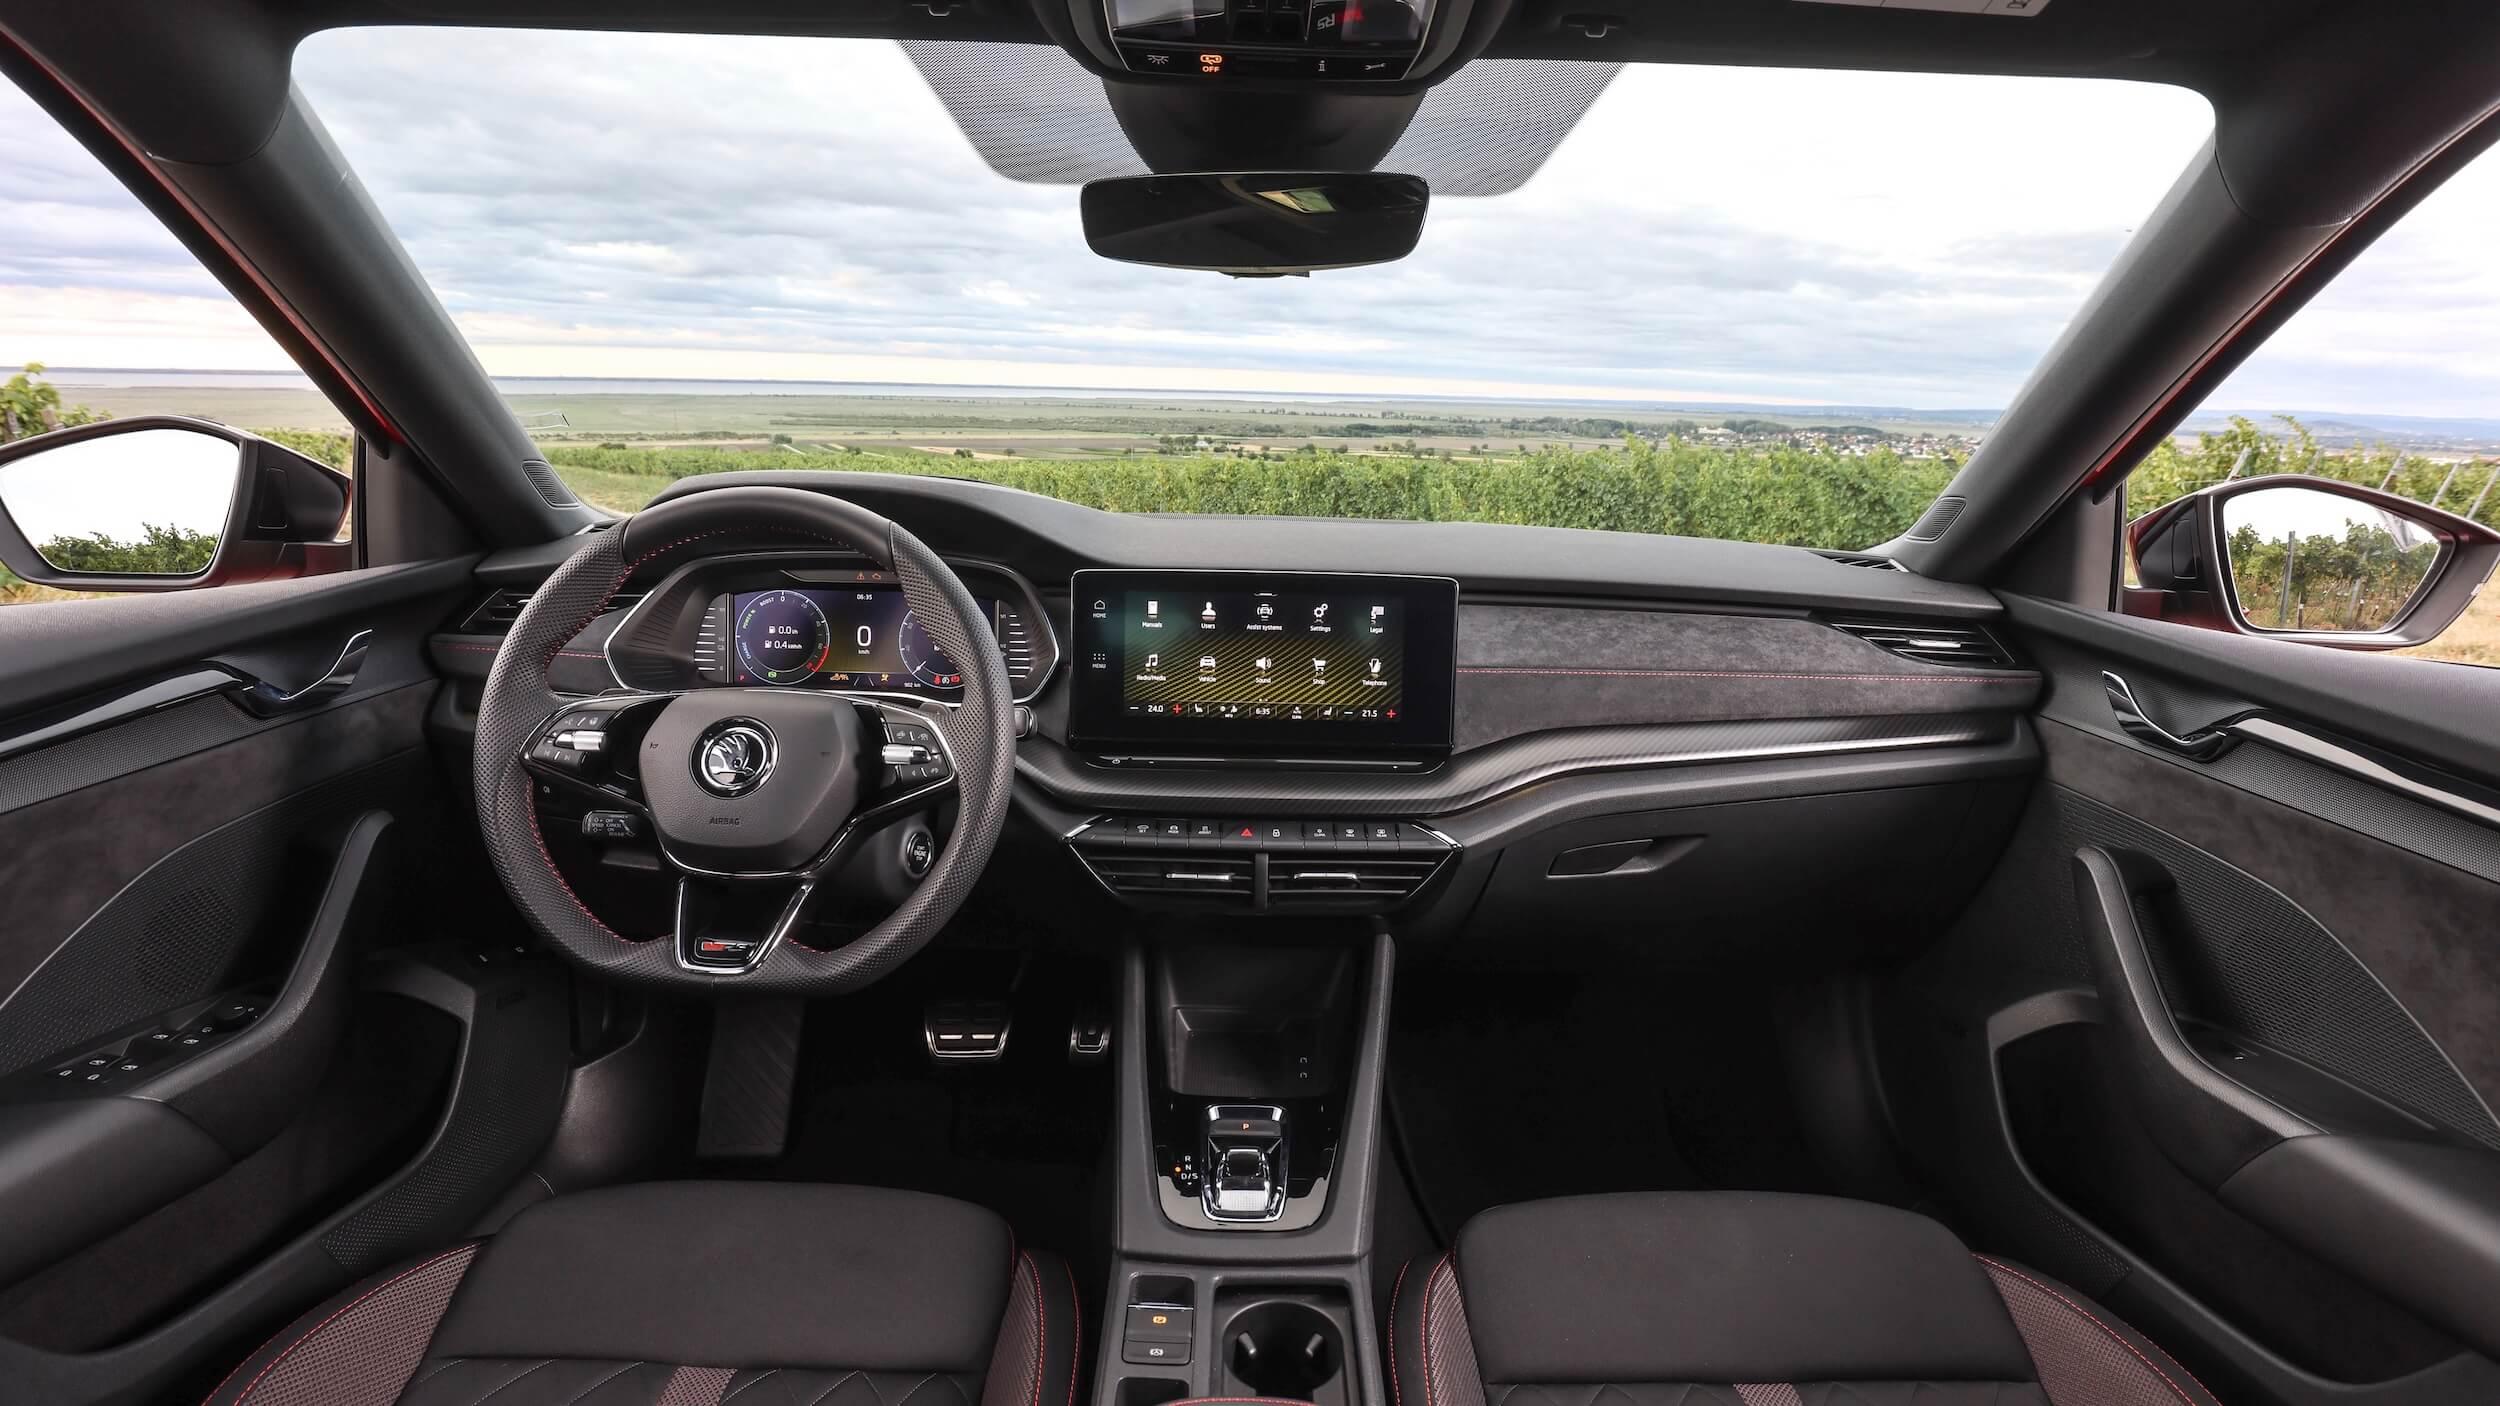 Skoda Octavia Combi RS iV Mk4 interieur